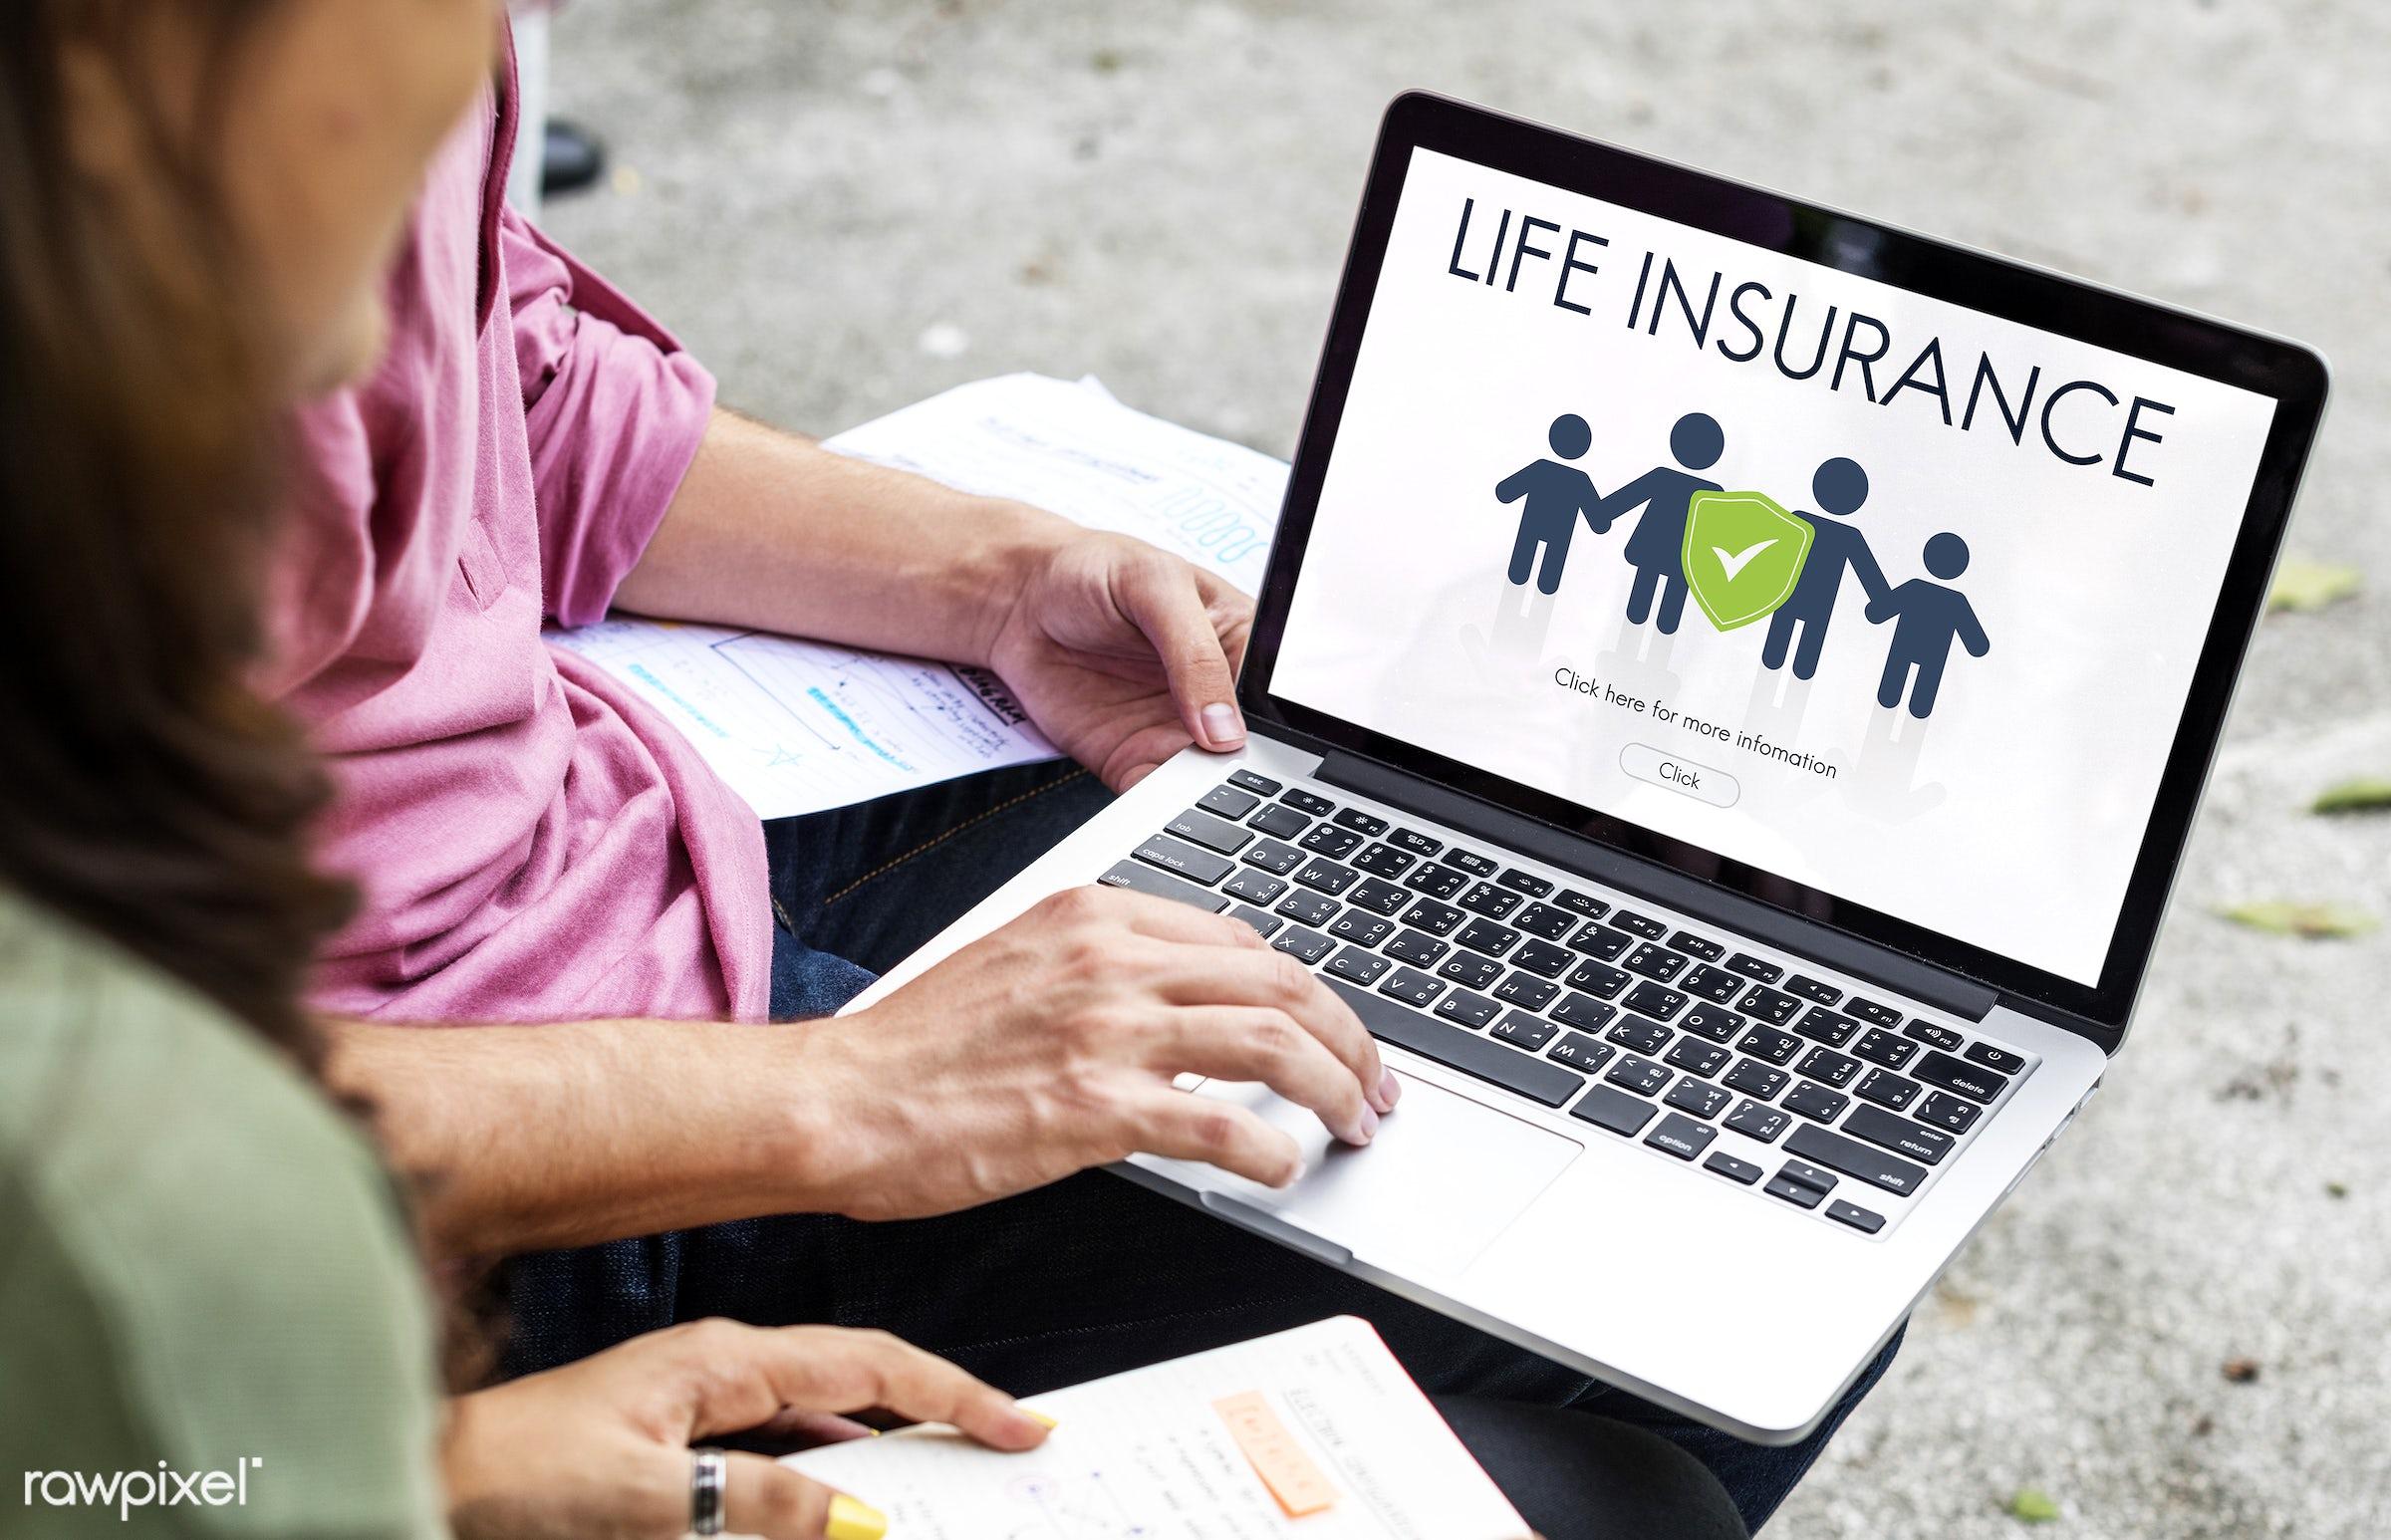 insurance, accident, asian, benefit, benefits, browsing, budget, cash, caucasian, compensation, coverage, devices, diversity...